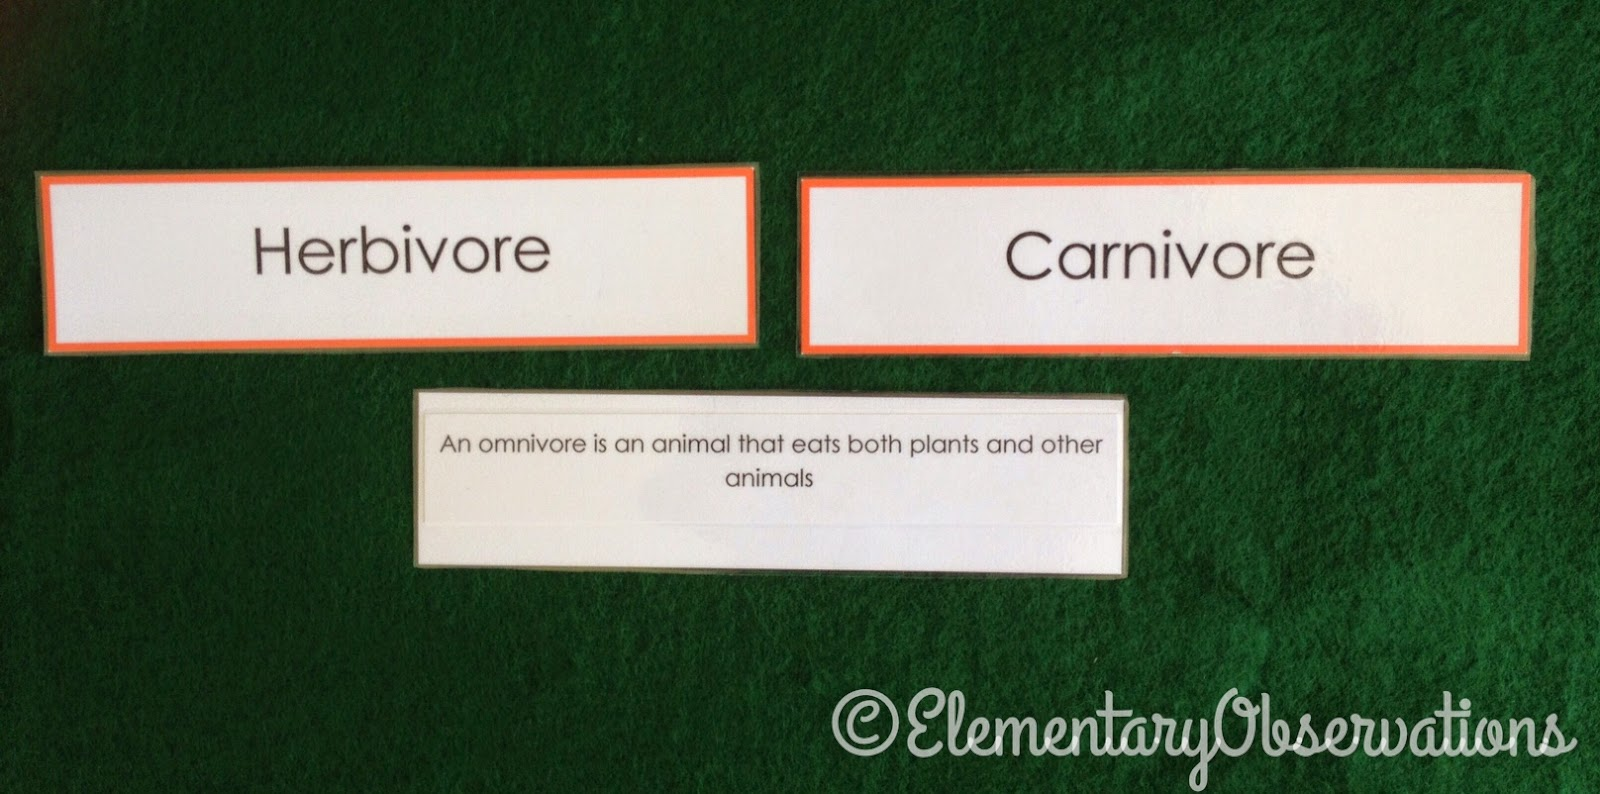 Elementary Observations Herbivore Carnivore Omnivore Sorting